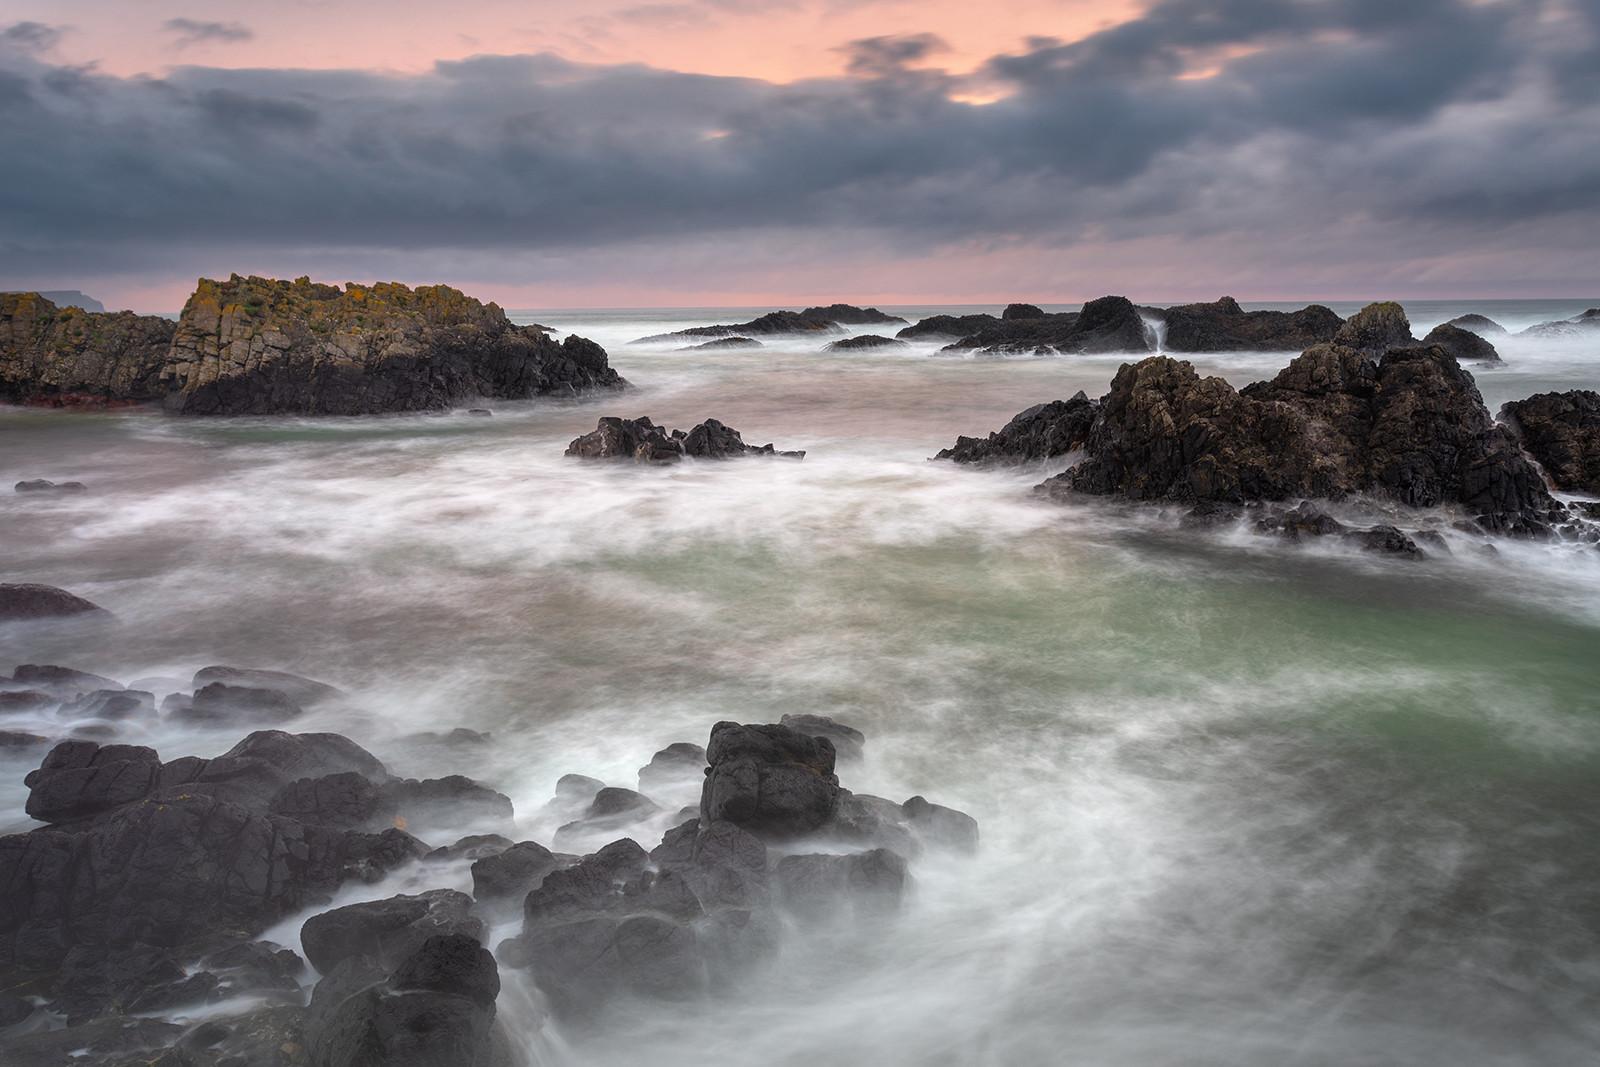 COLOUR - Daydream by Thomas Richardson (12 marks)